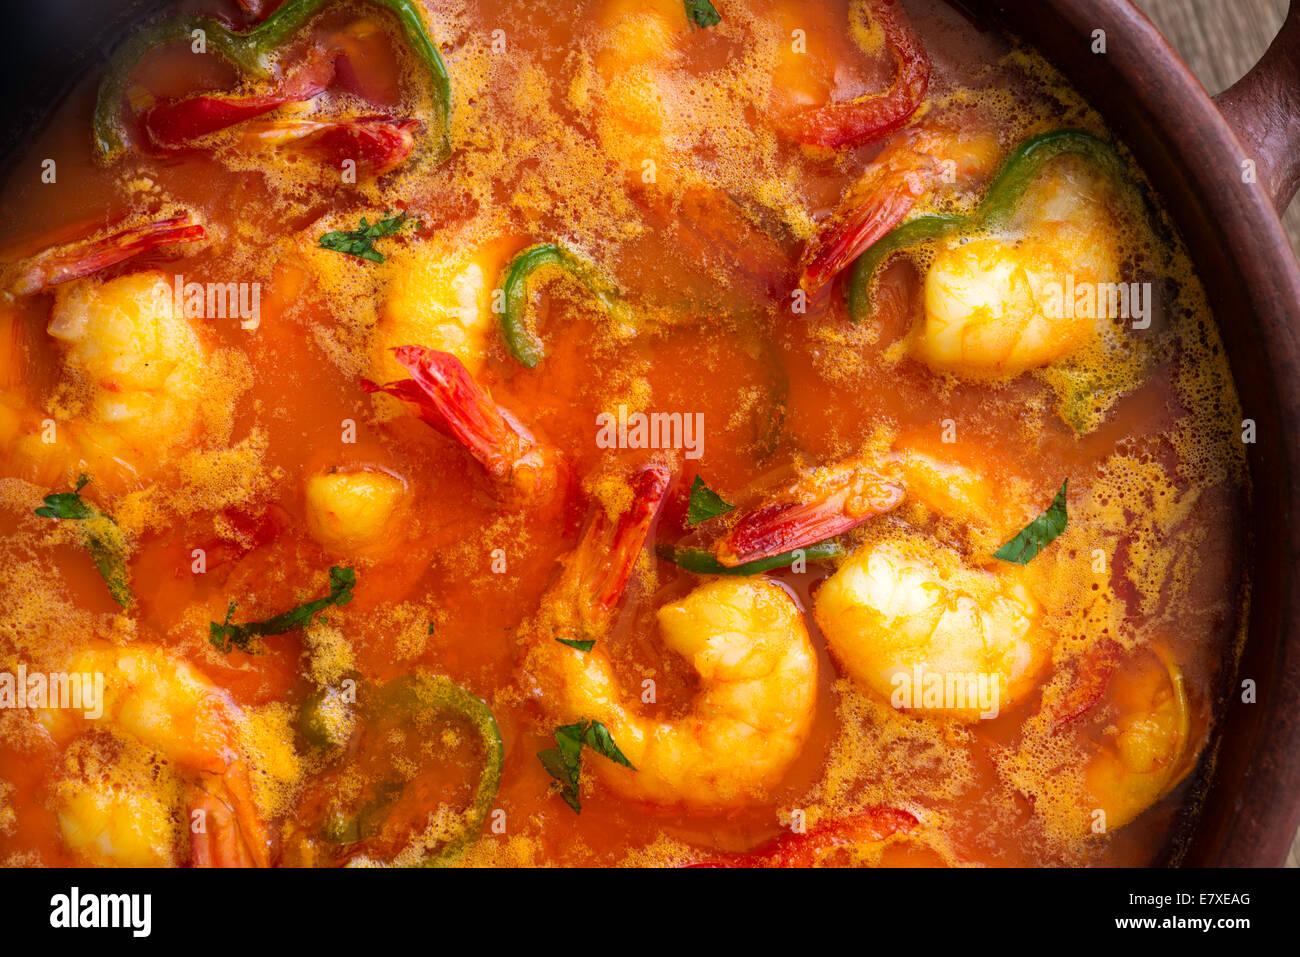 Moqueca of shrimps, Brazilian dish - Stock Image